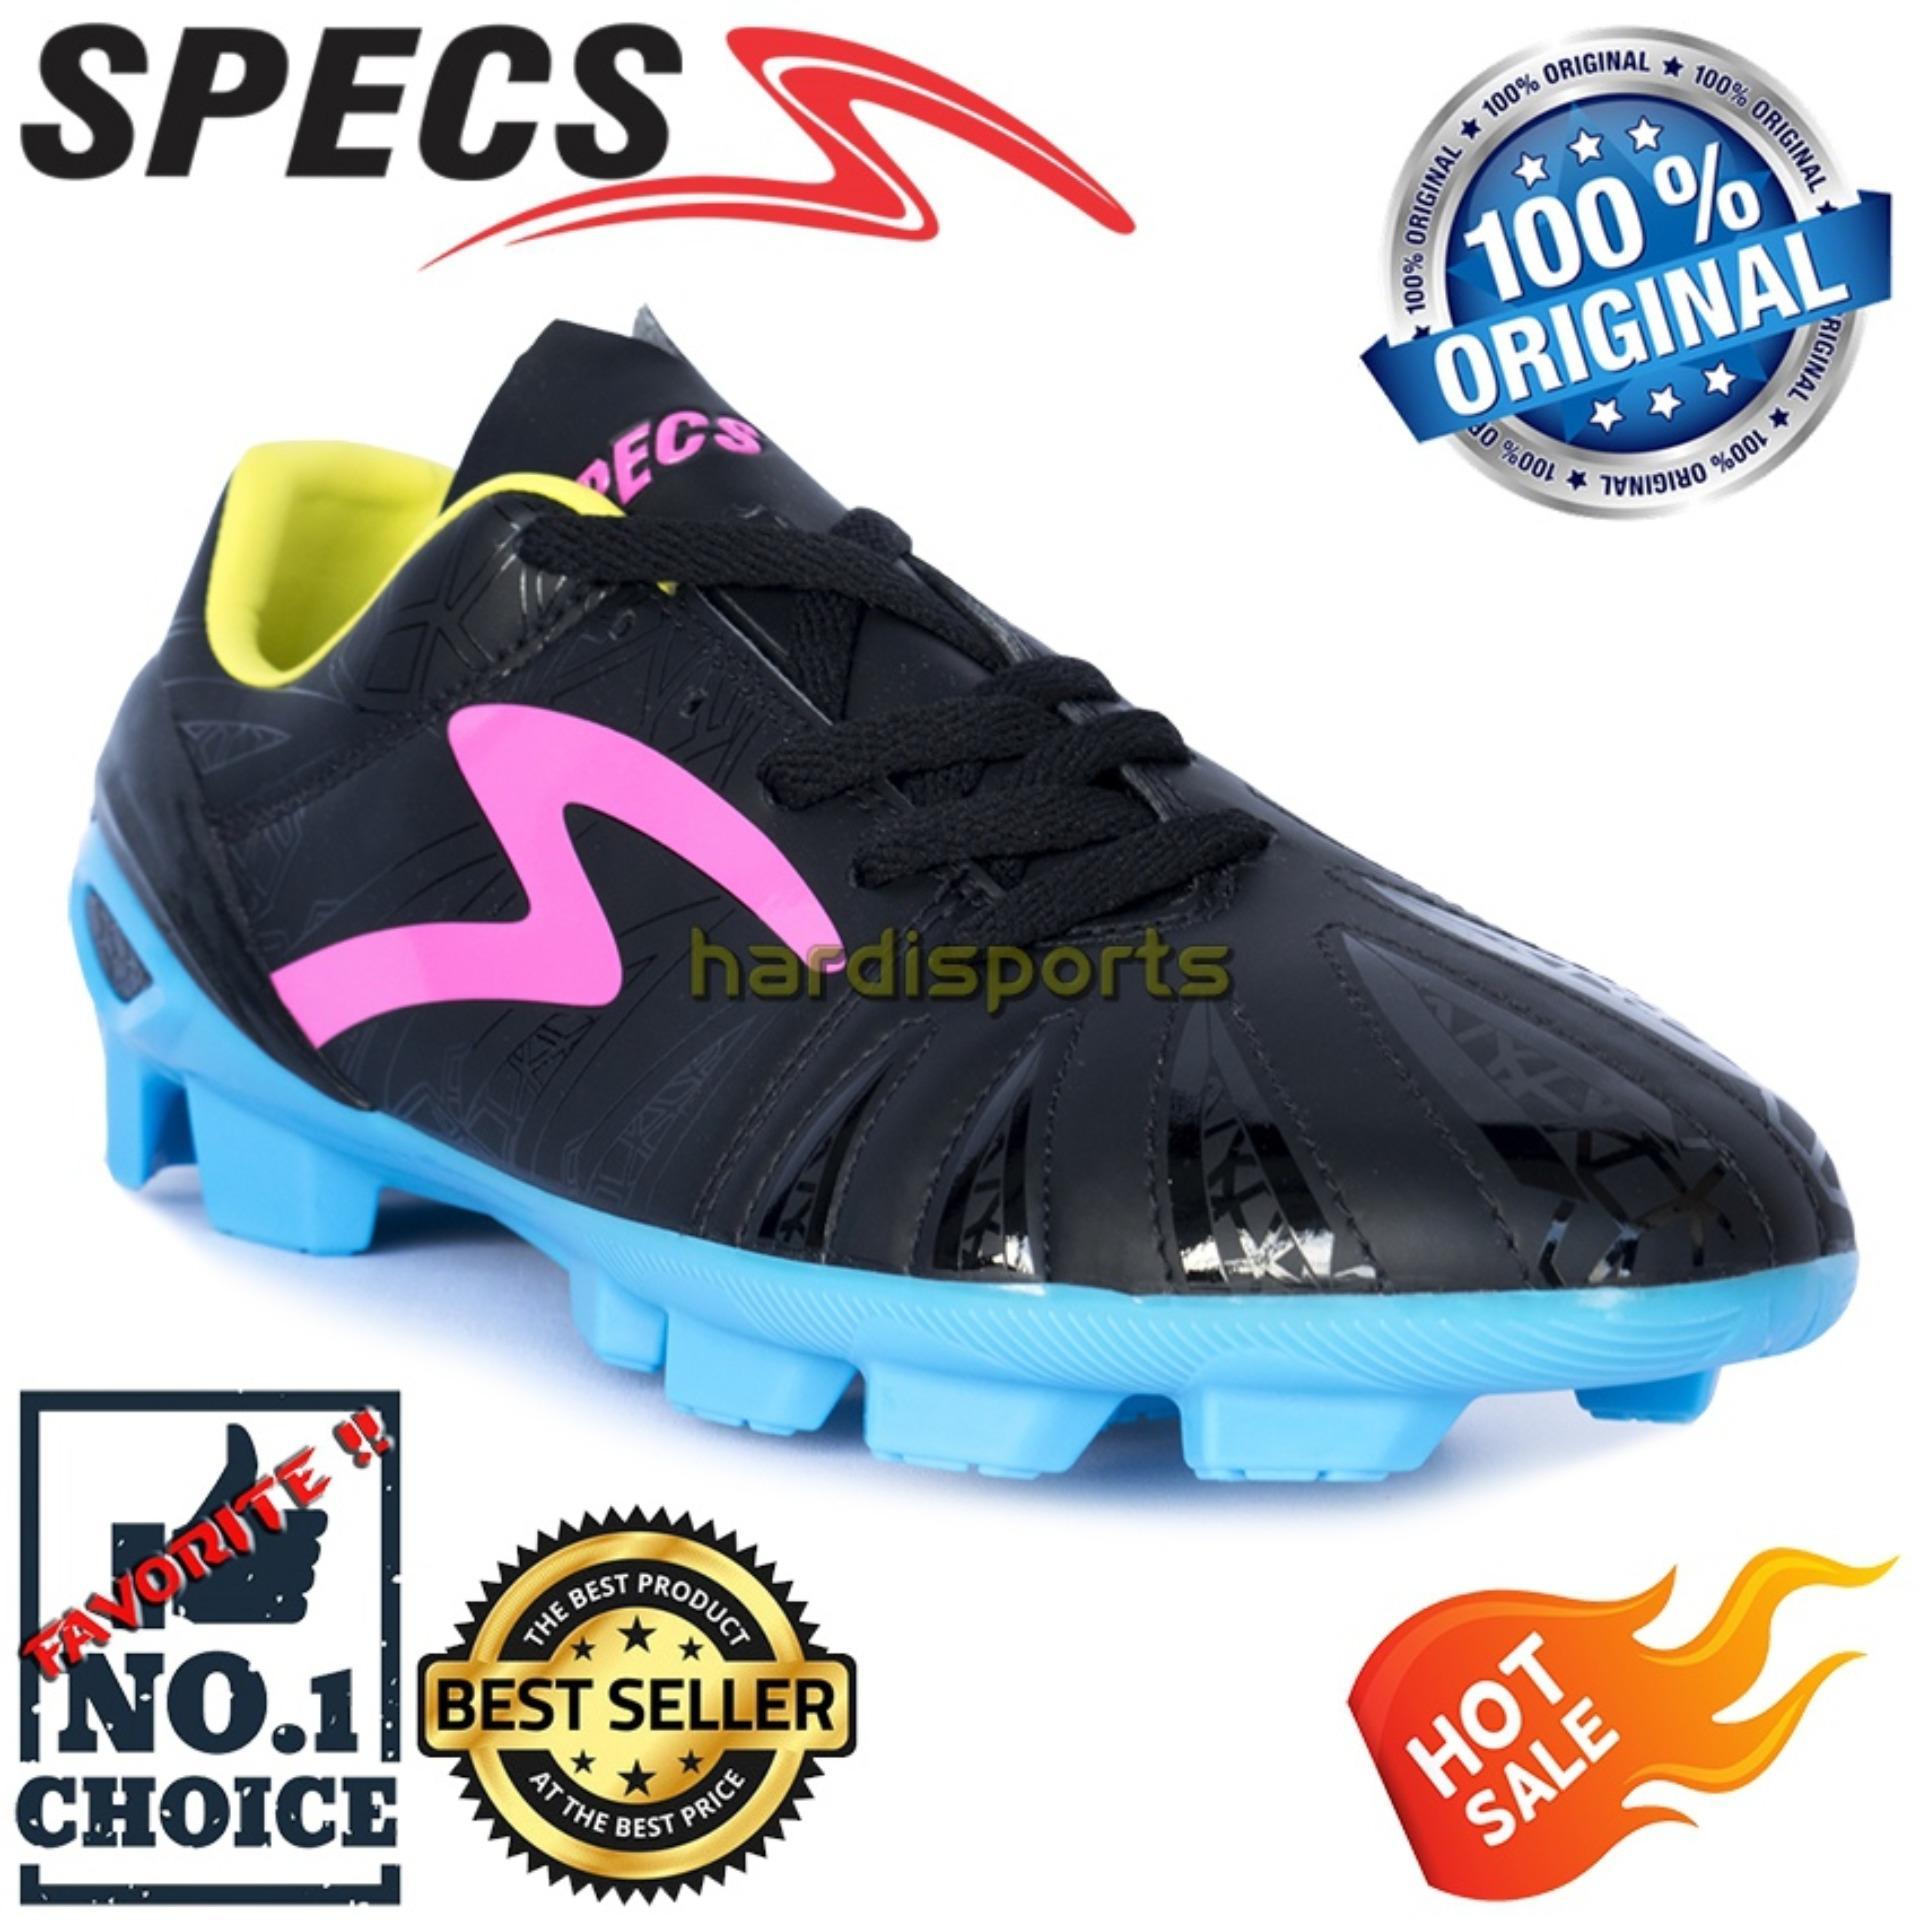 Jual Beli Sepatu Sepakbola Specs Tomahawk Fg